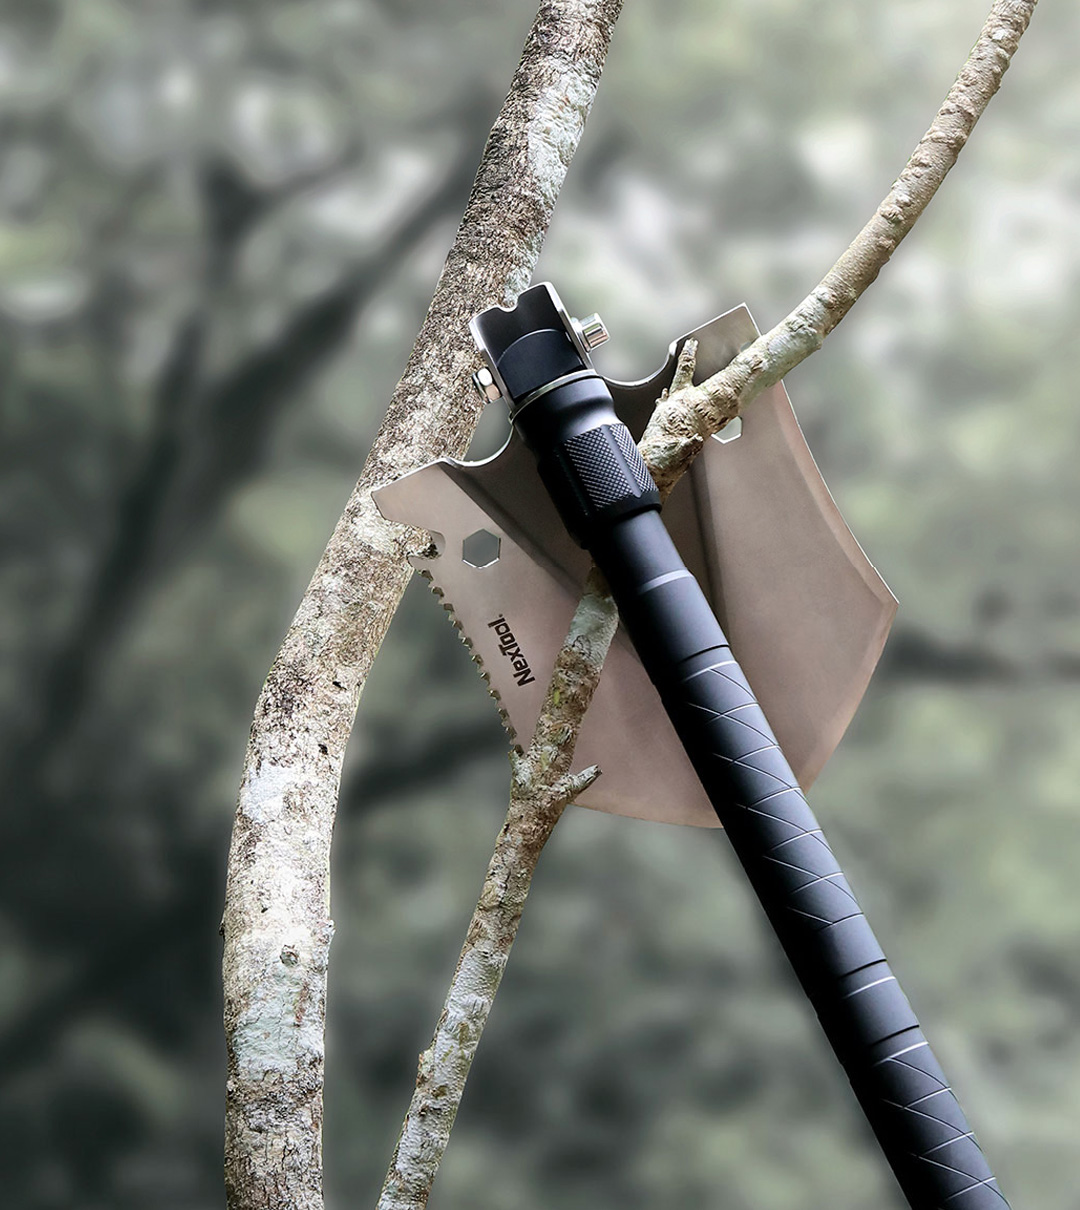 Xiaomi Nextool Multifunctional Shovel Kits